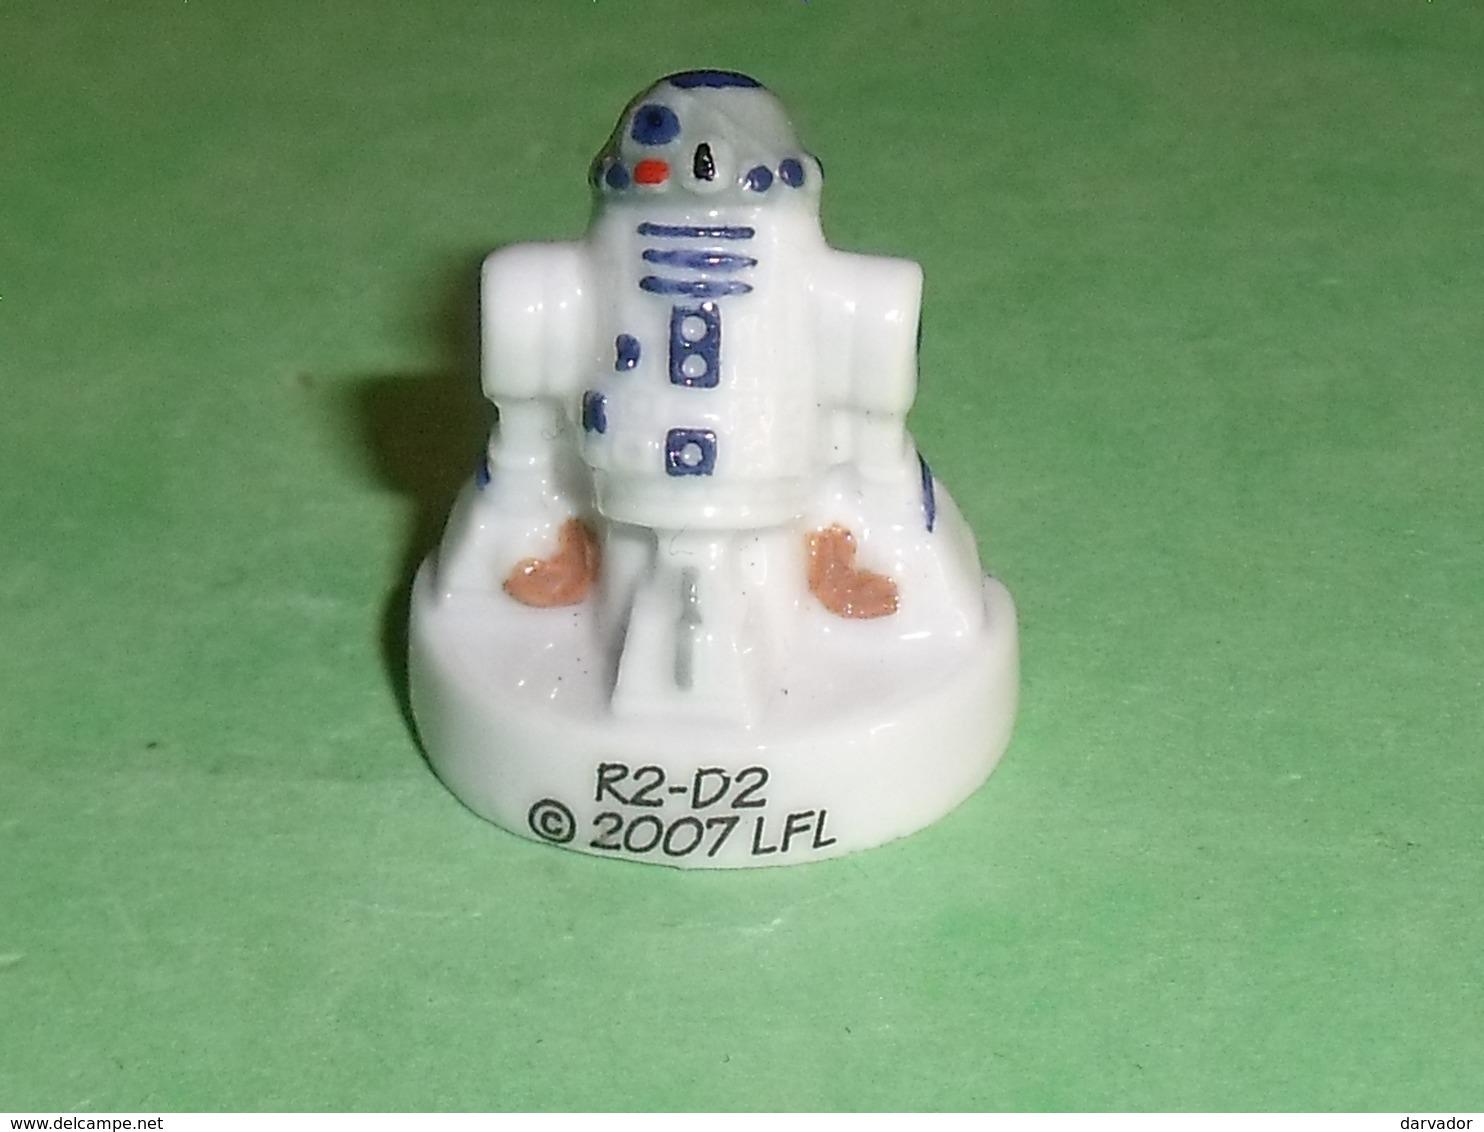 Fèves / Dessins Animés / Film / BD : Star Wars , R2 D2 , 2007 T50 - Cartoons